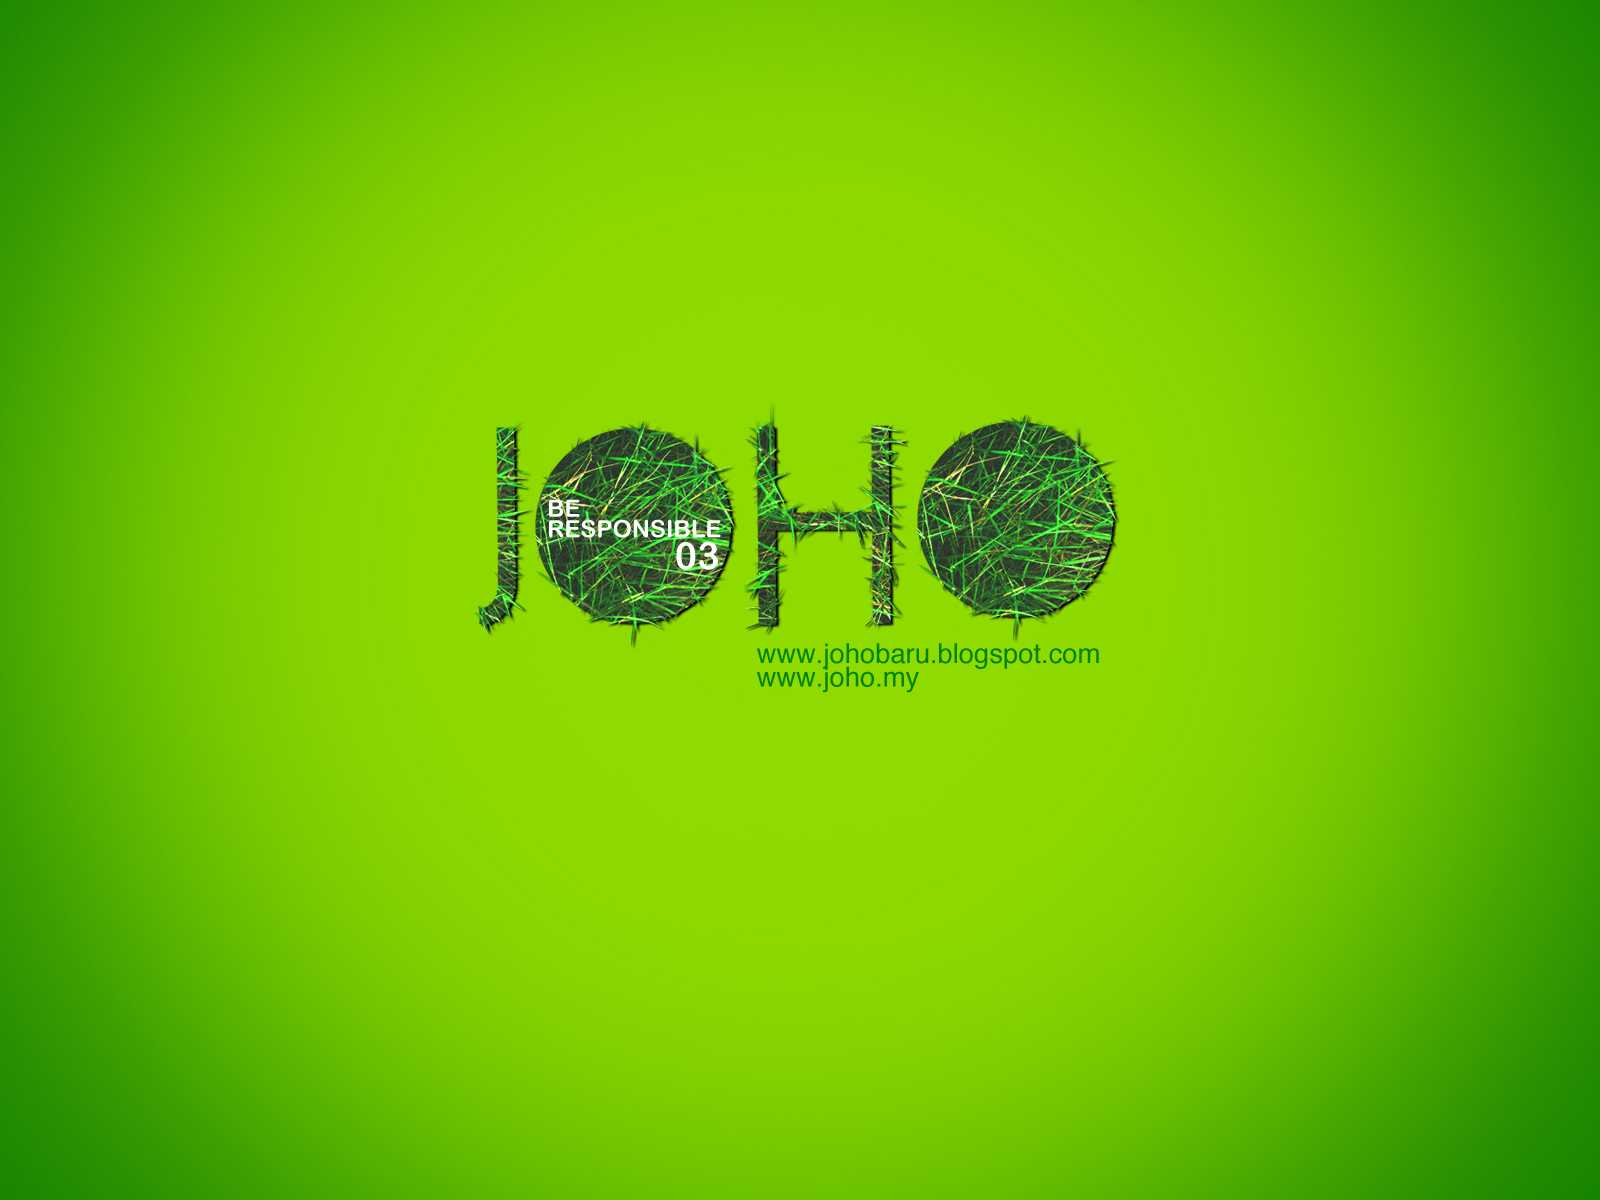 JOHO Wallpaper December 2011 Be Responsible